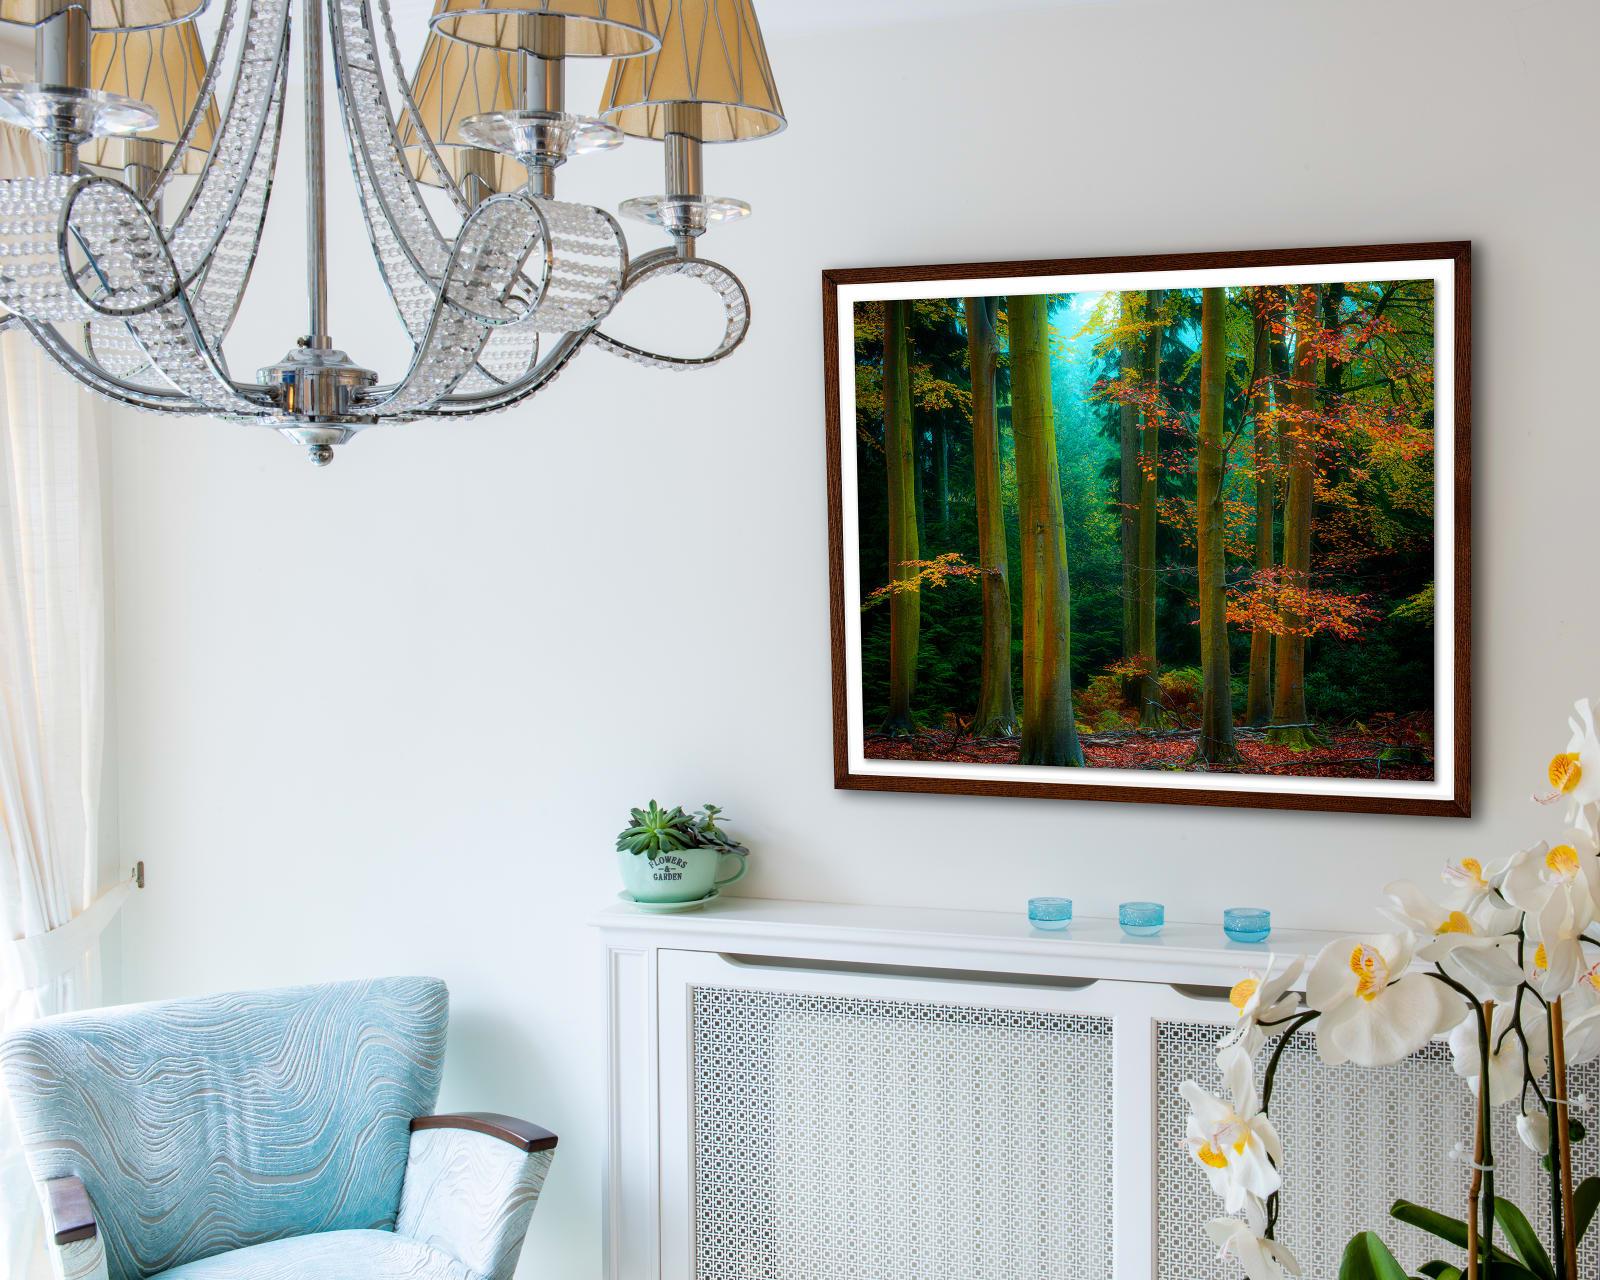 Float mounted fine art print in a walnut frame behind fine art anti-reflective glass